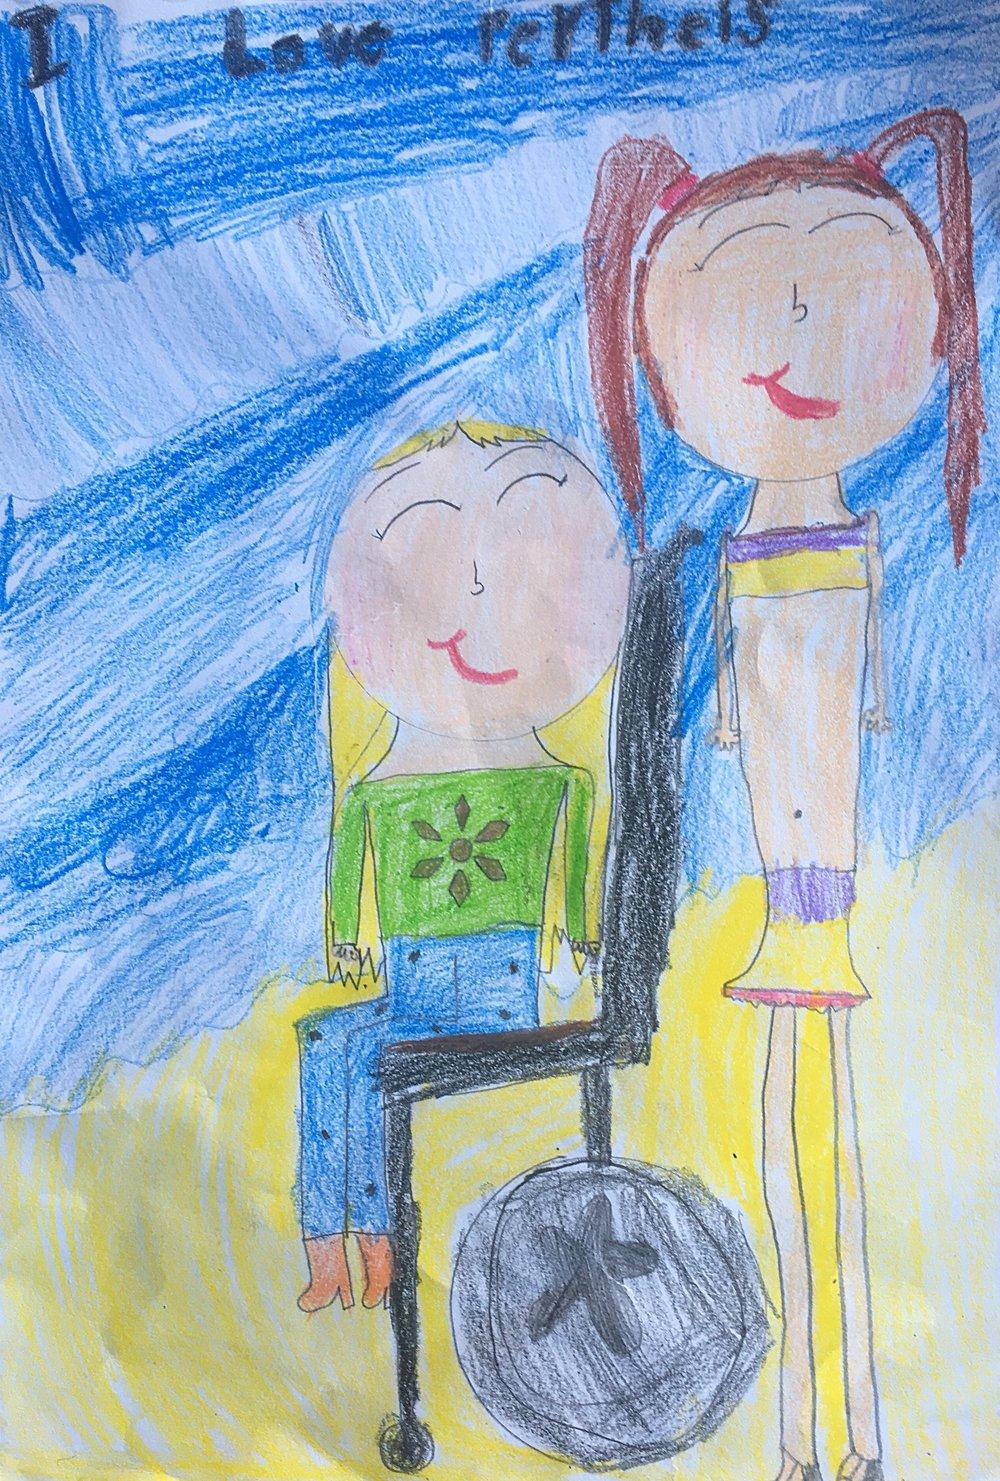 002 - WHEELIES IN MY WHEELCHAIR by Ruby Mulhearn (age 7) in Gold Coast, Australia